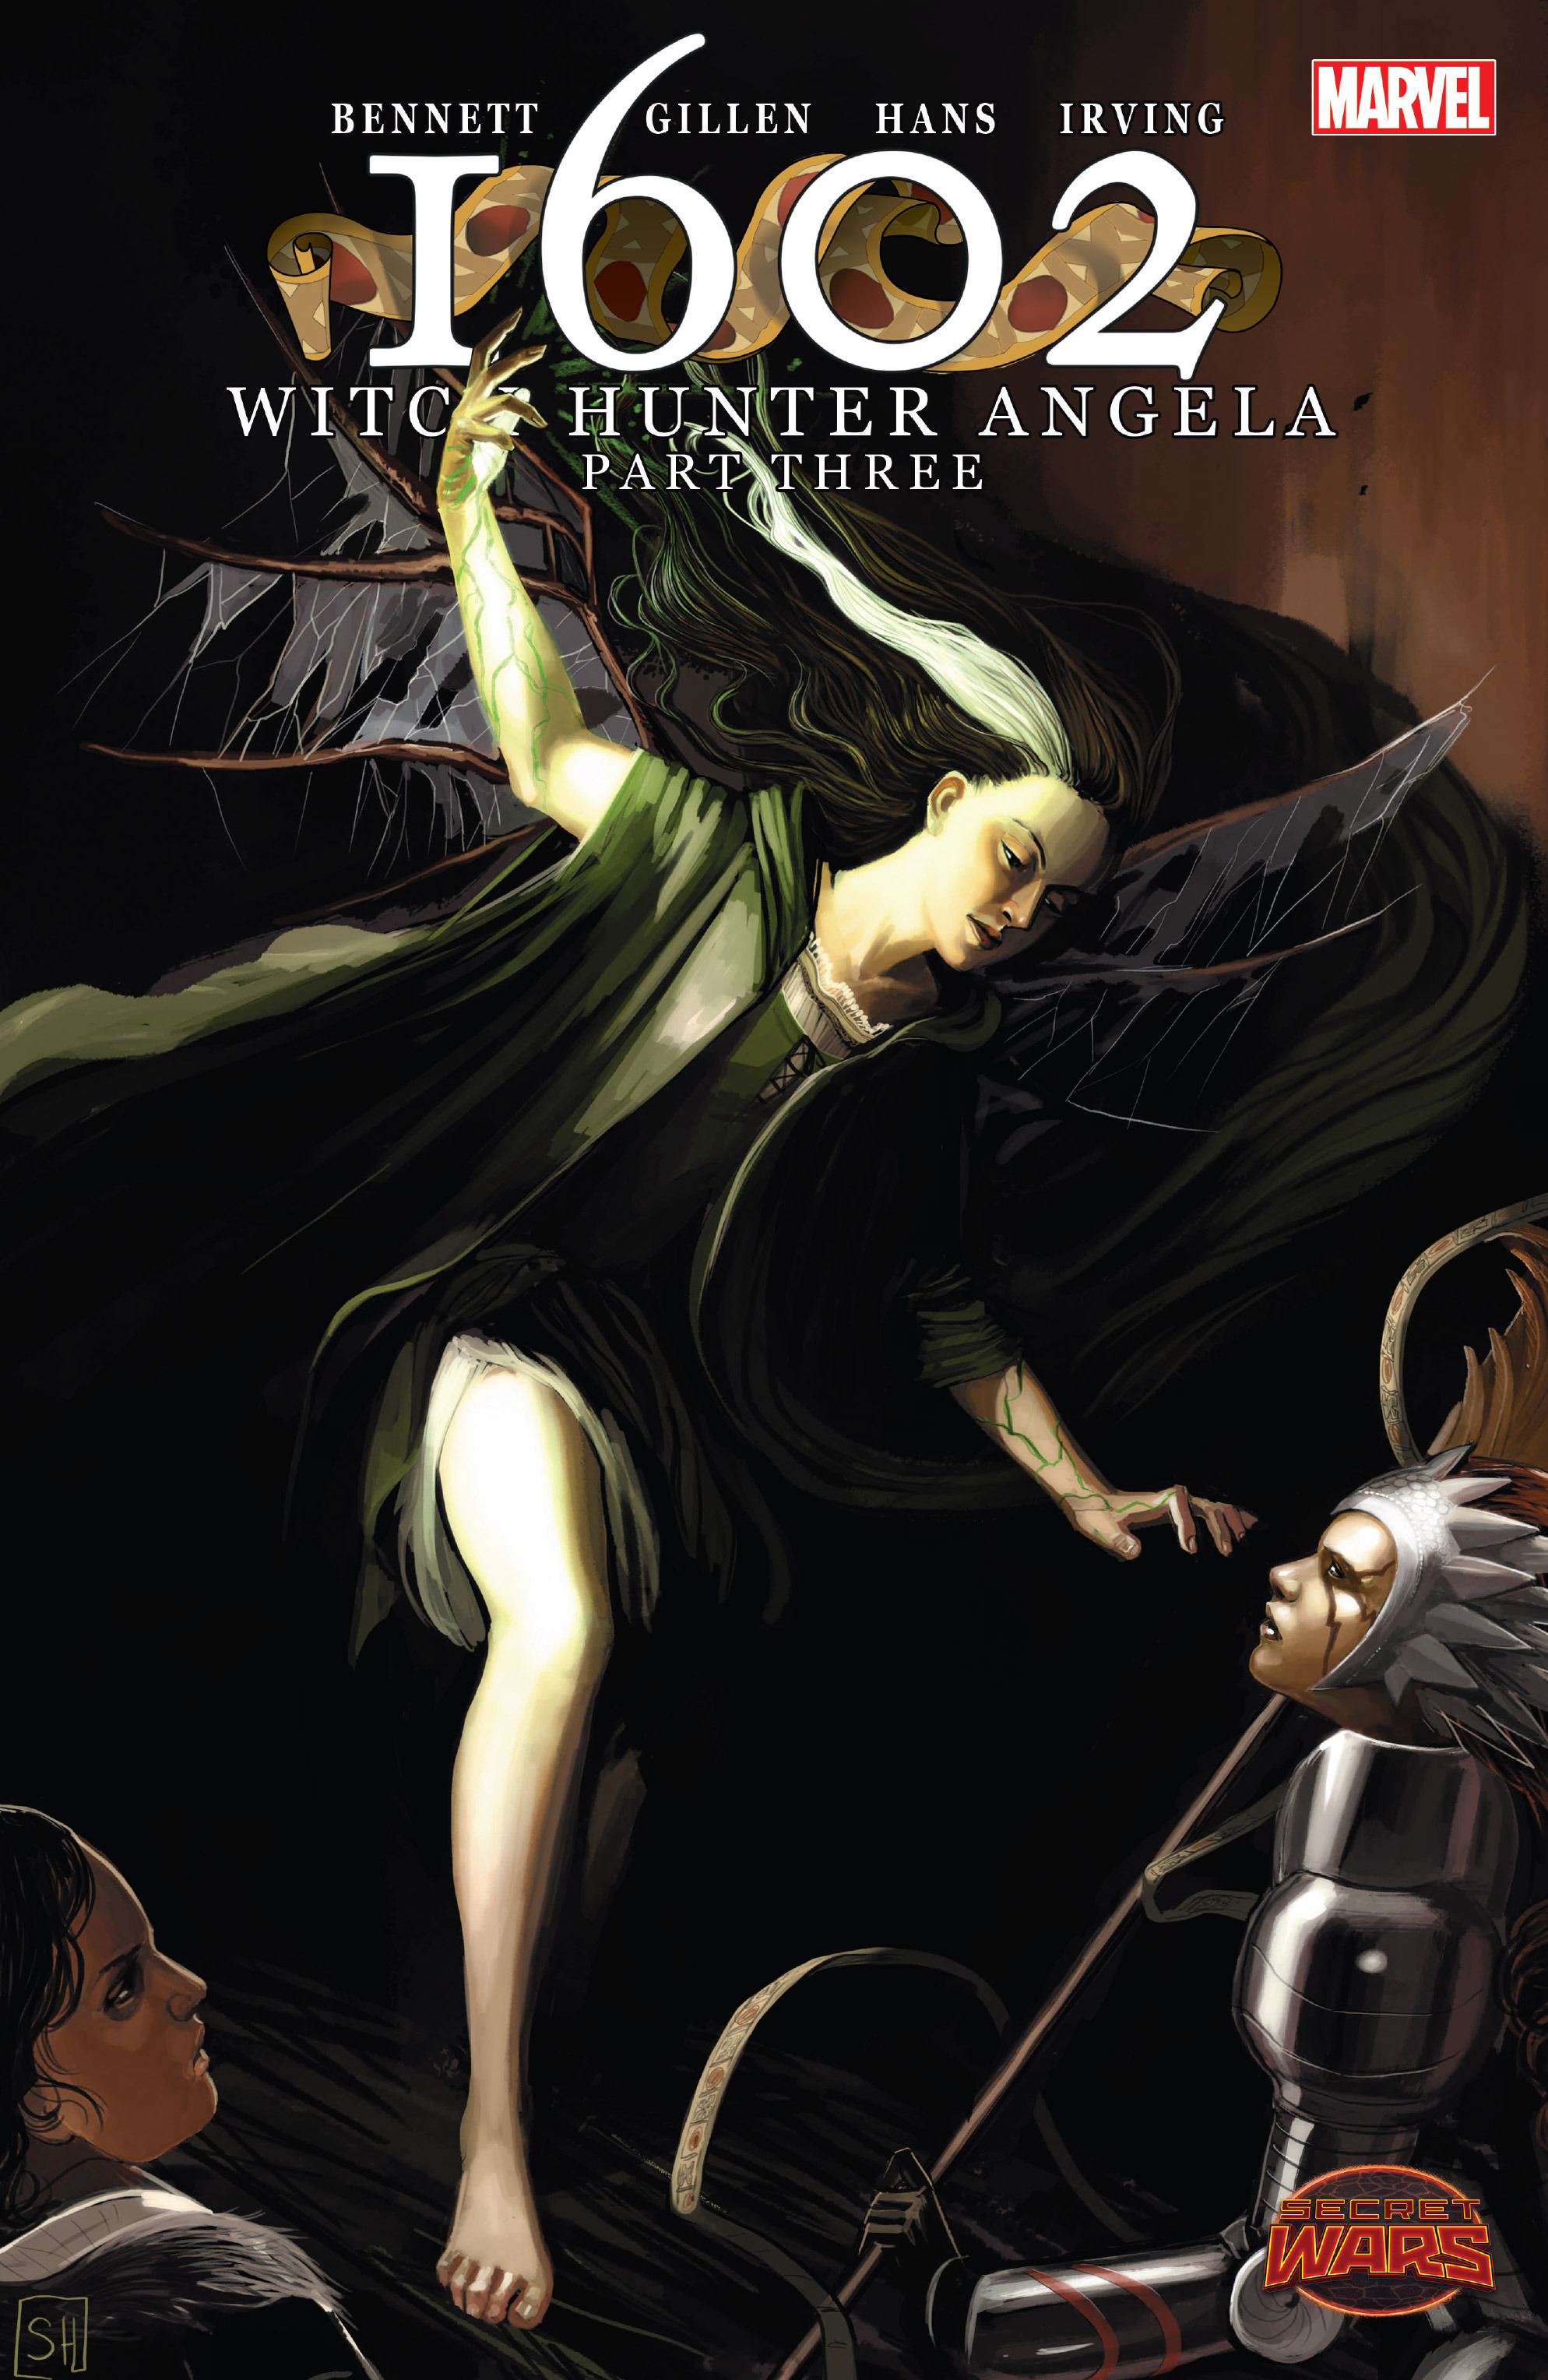 1602 Witch Hunter Angela 3 Page 1